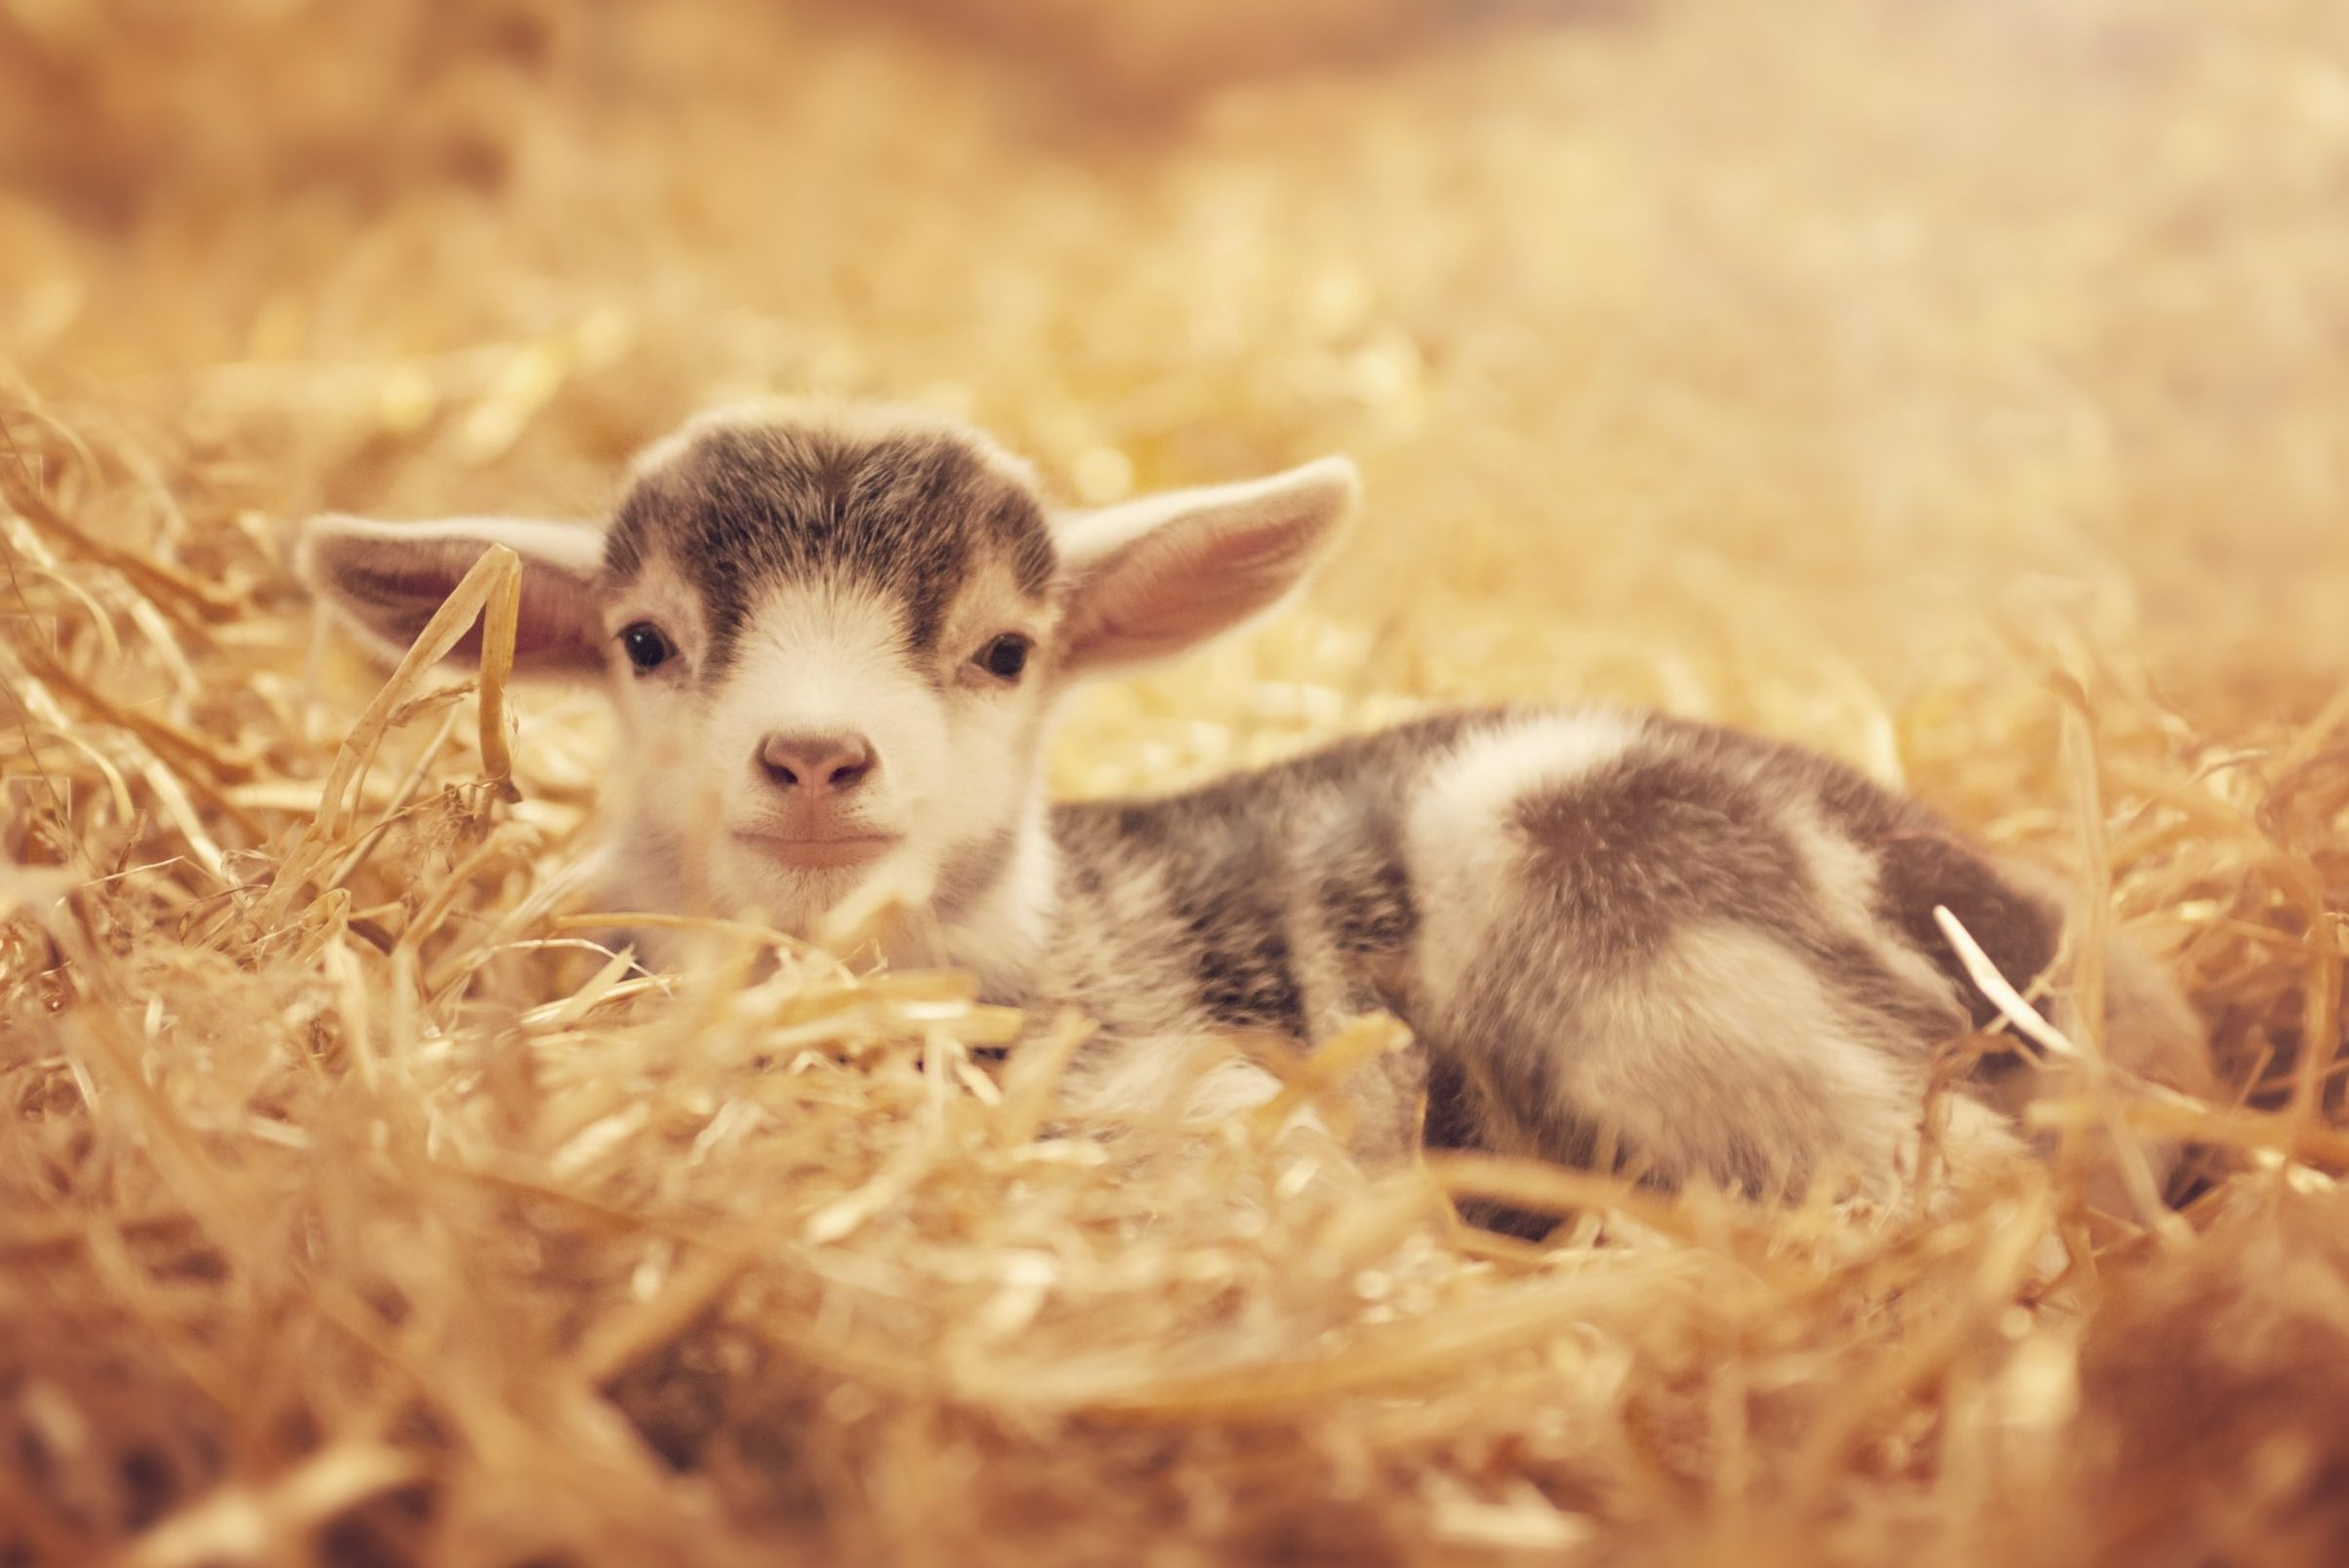 Kid - baby goat